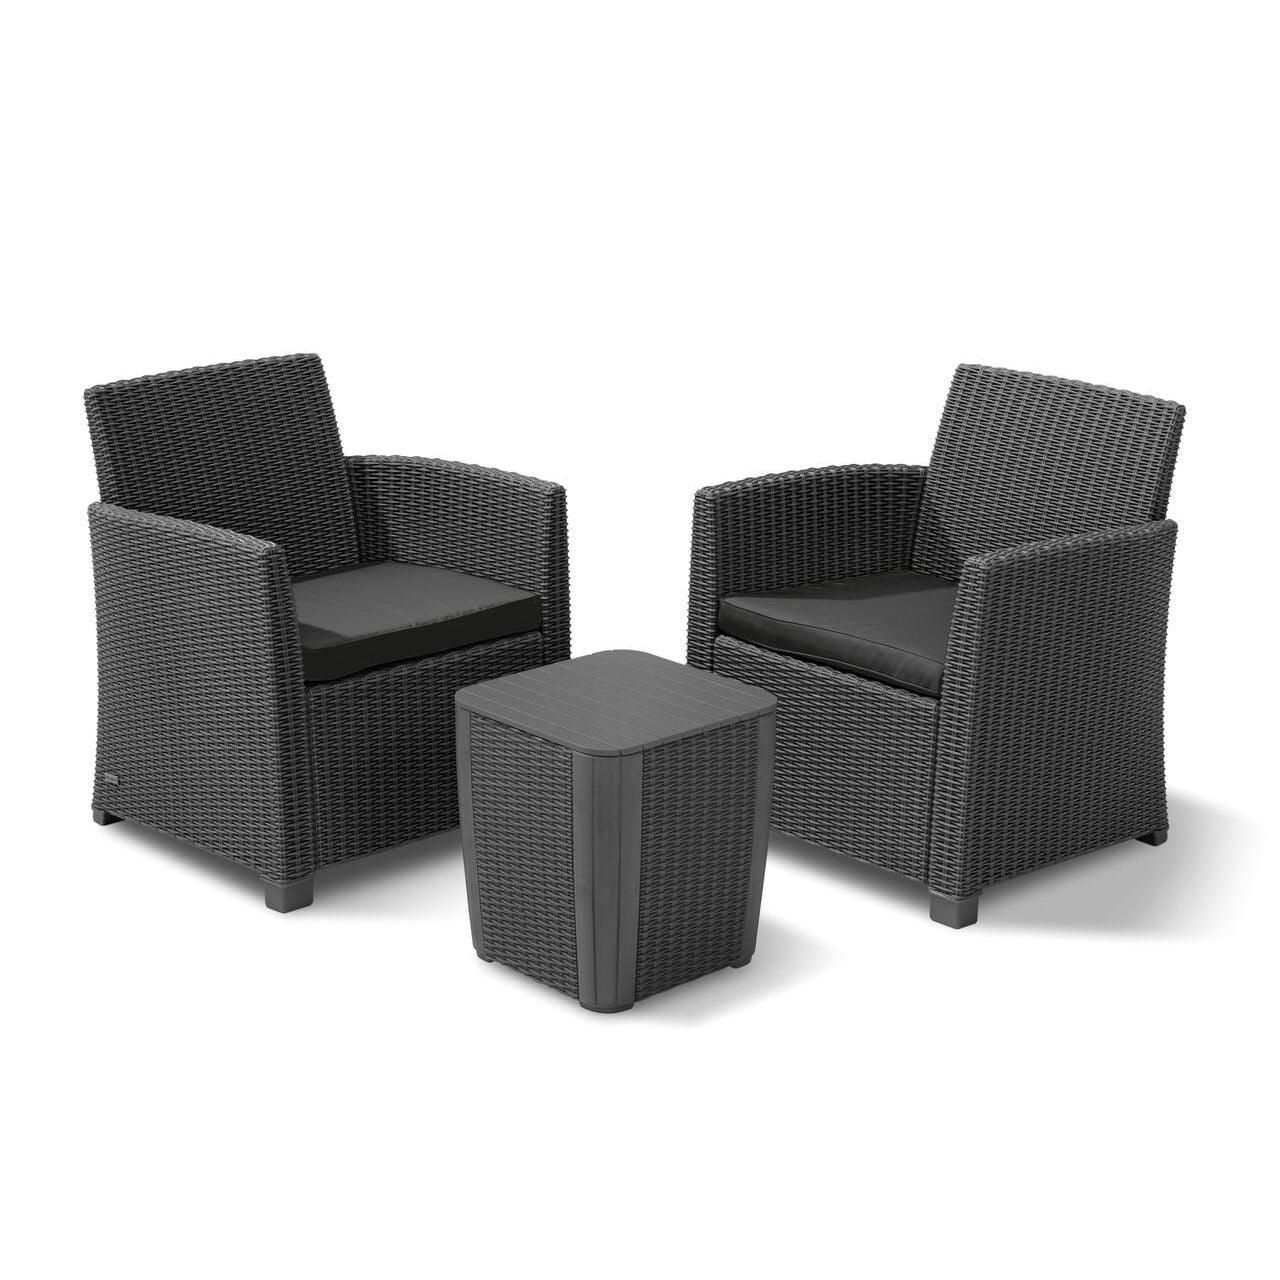 Corona Grey Resin and Fabric 3-piece Balcony Set (Graphit...